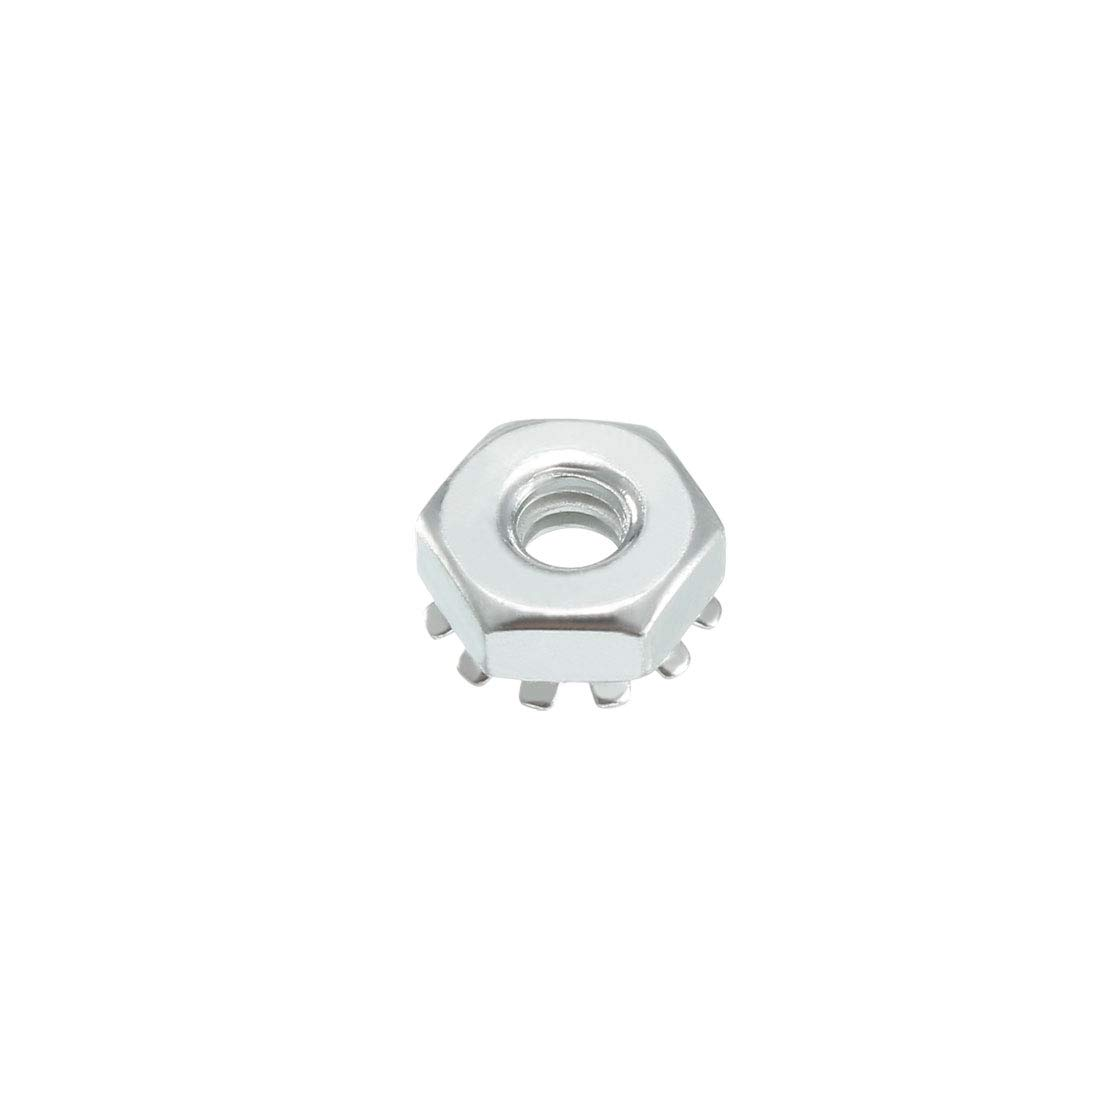 uxcell M6 X 1-Pitch Carbon Steel Female Thread Kep Hex Head Lock Nut 100pcs